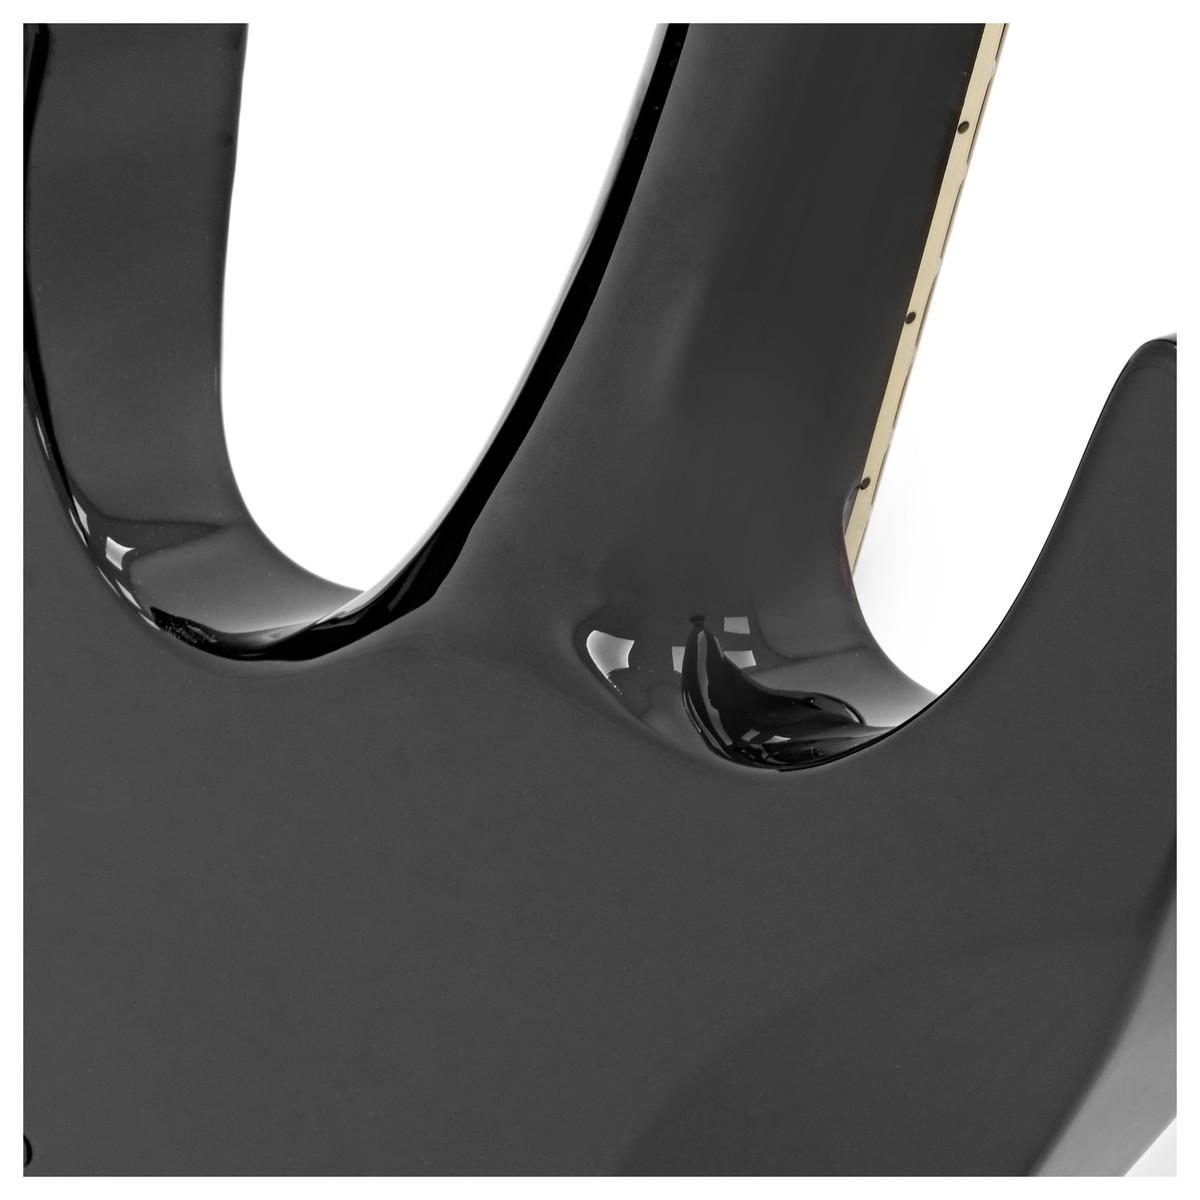 Portable Emg Amplifier Jeff Bingham